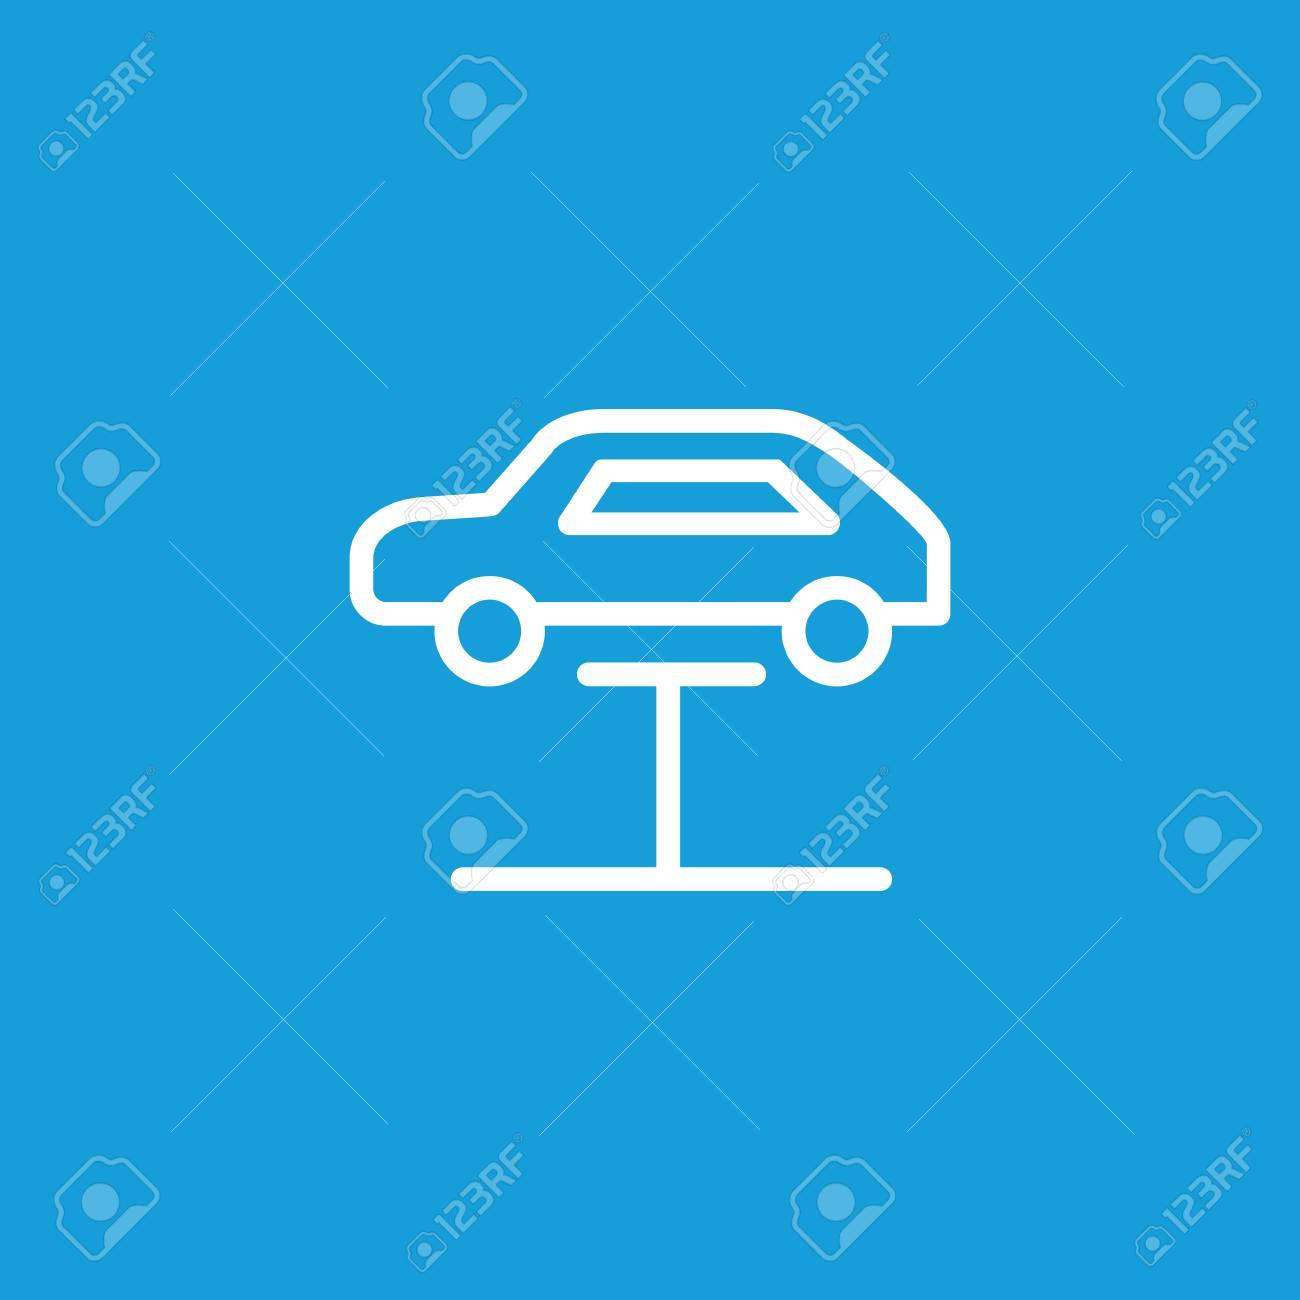 Icon of car repair  Lift, elevator, garage  Car service concept